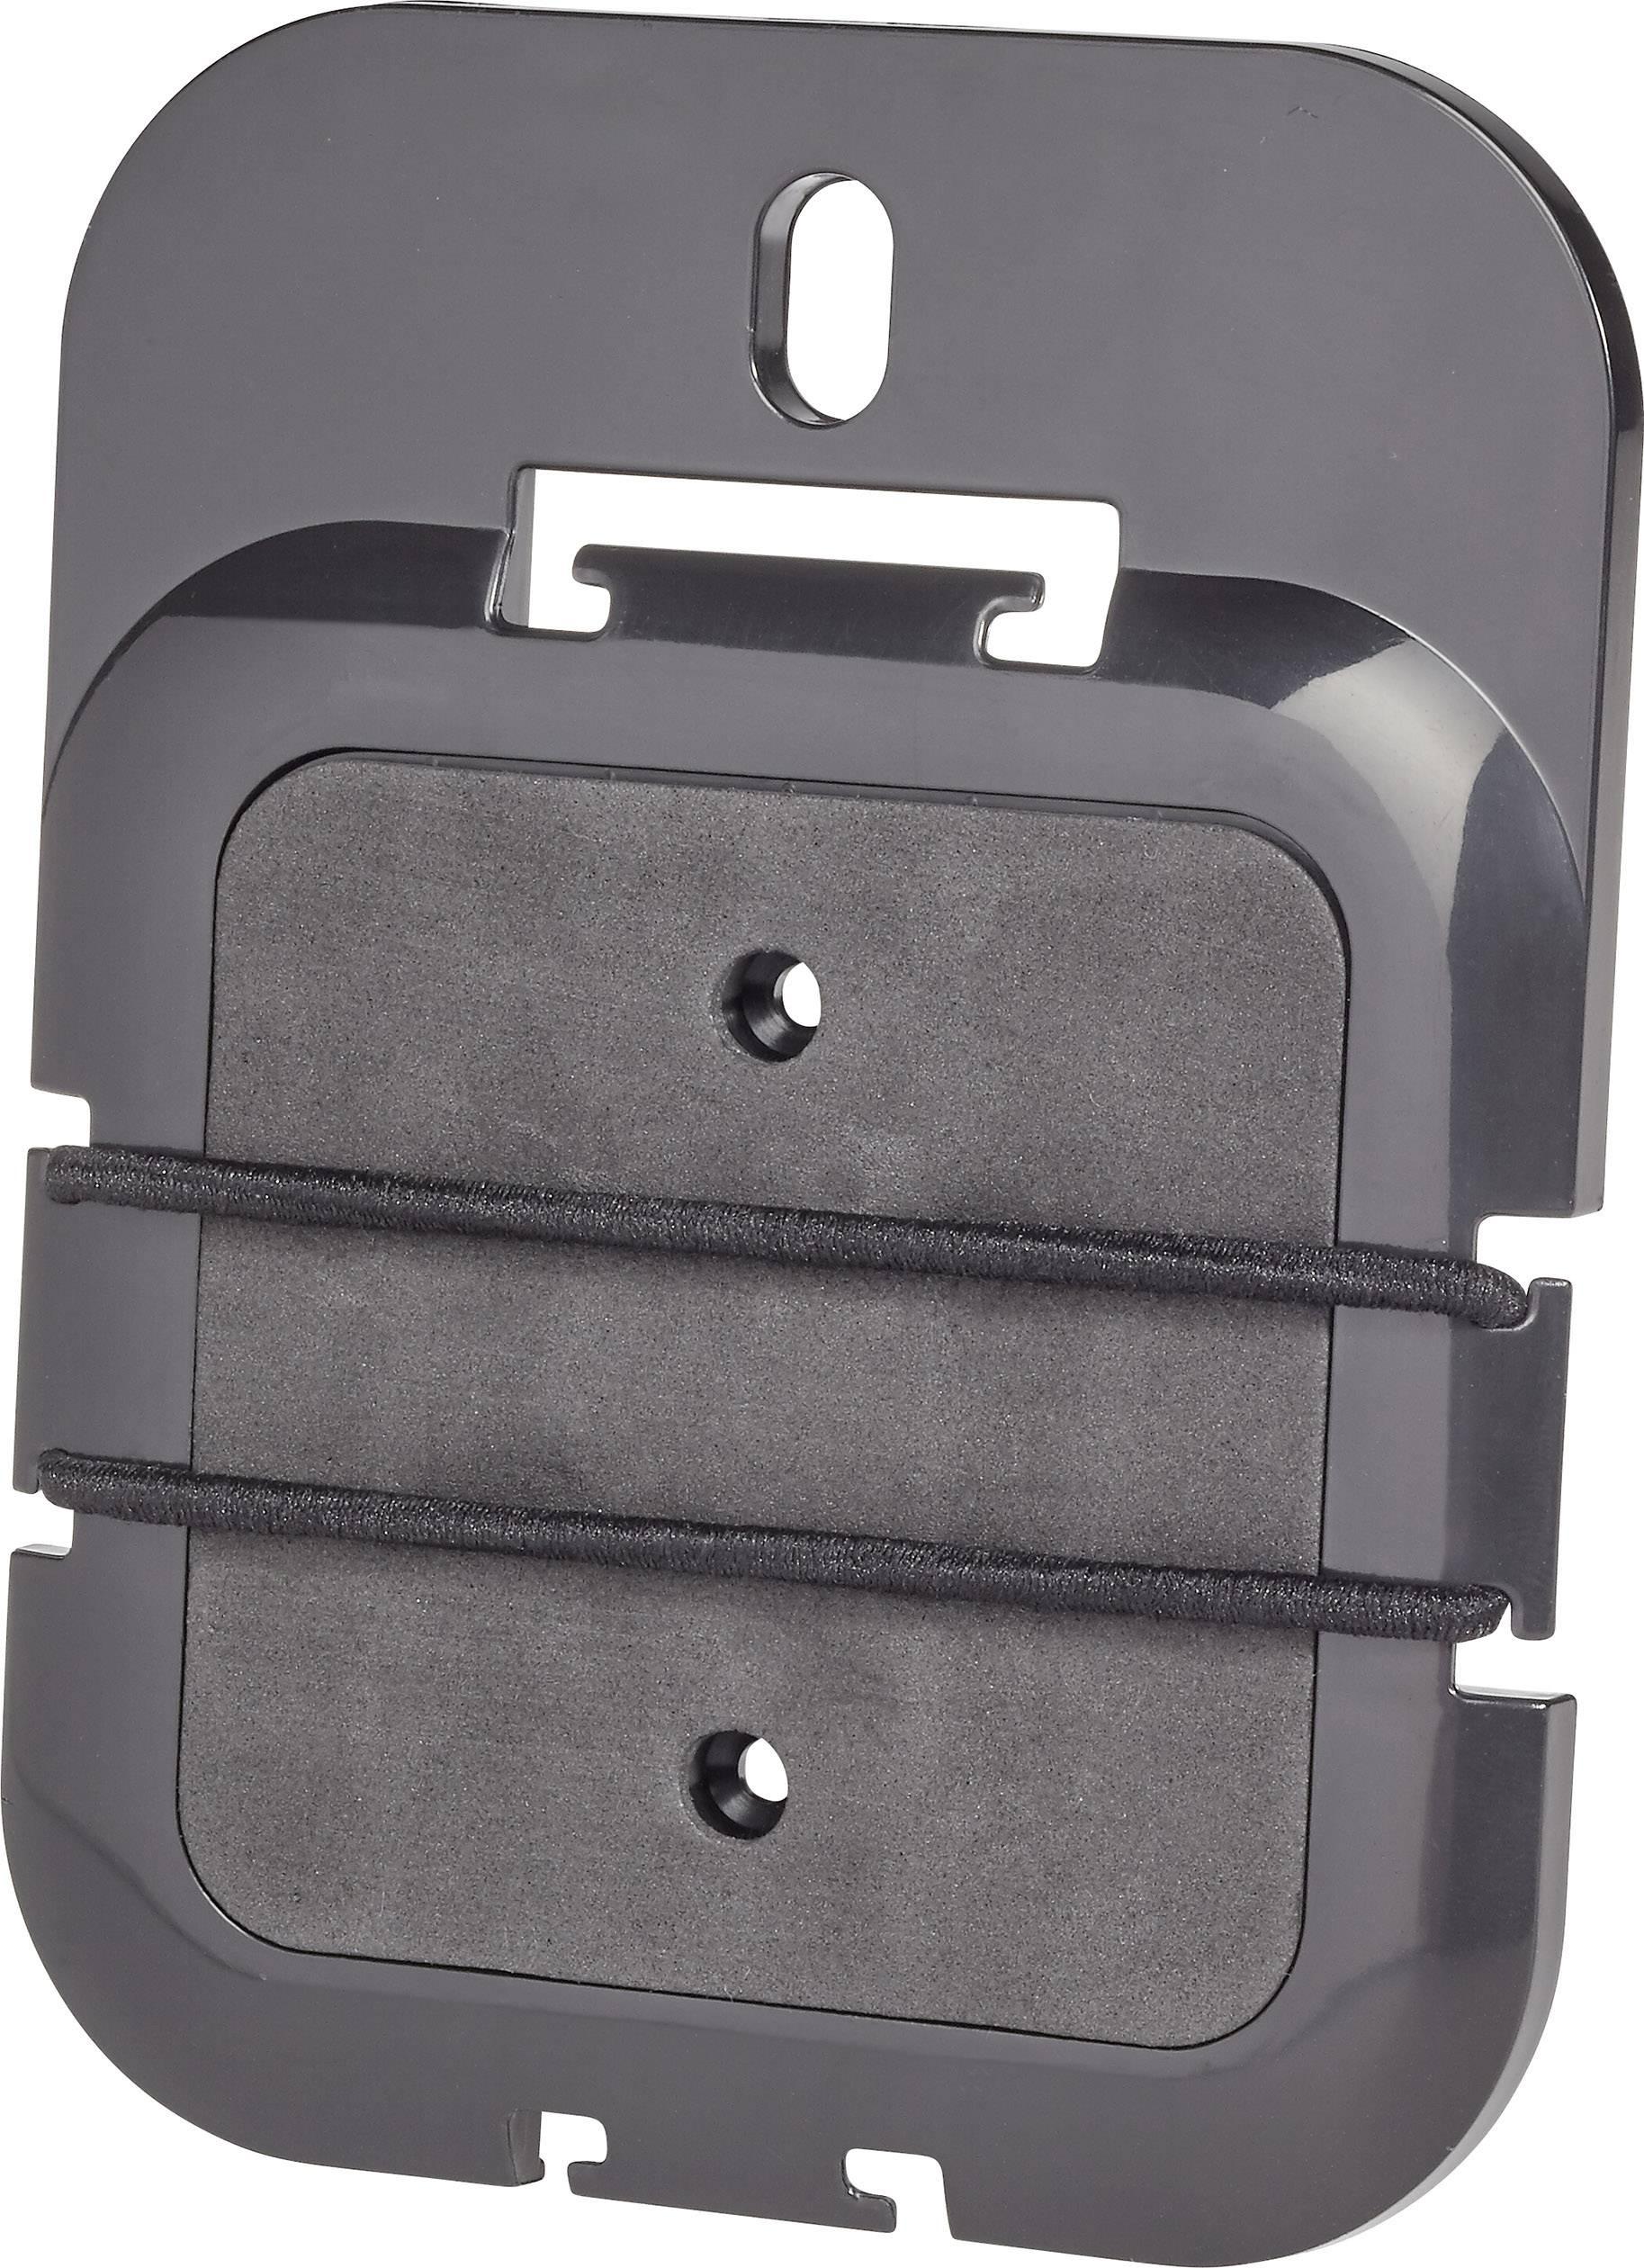 Upevňovací deska s popruhy SpeaKa Professional SP-5680236, (š x v x h) 10.3 x 13.5 x 0.9 cm, černá